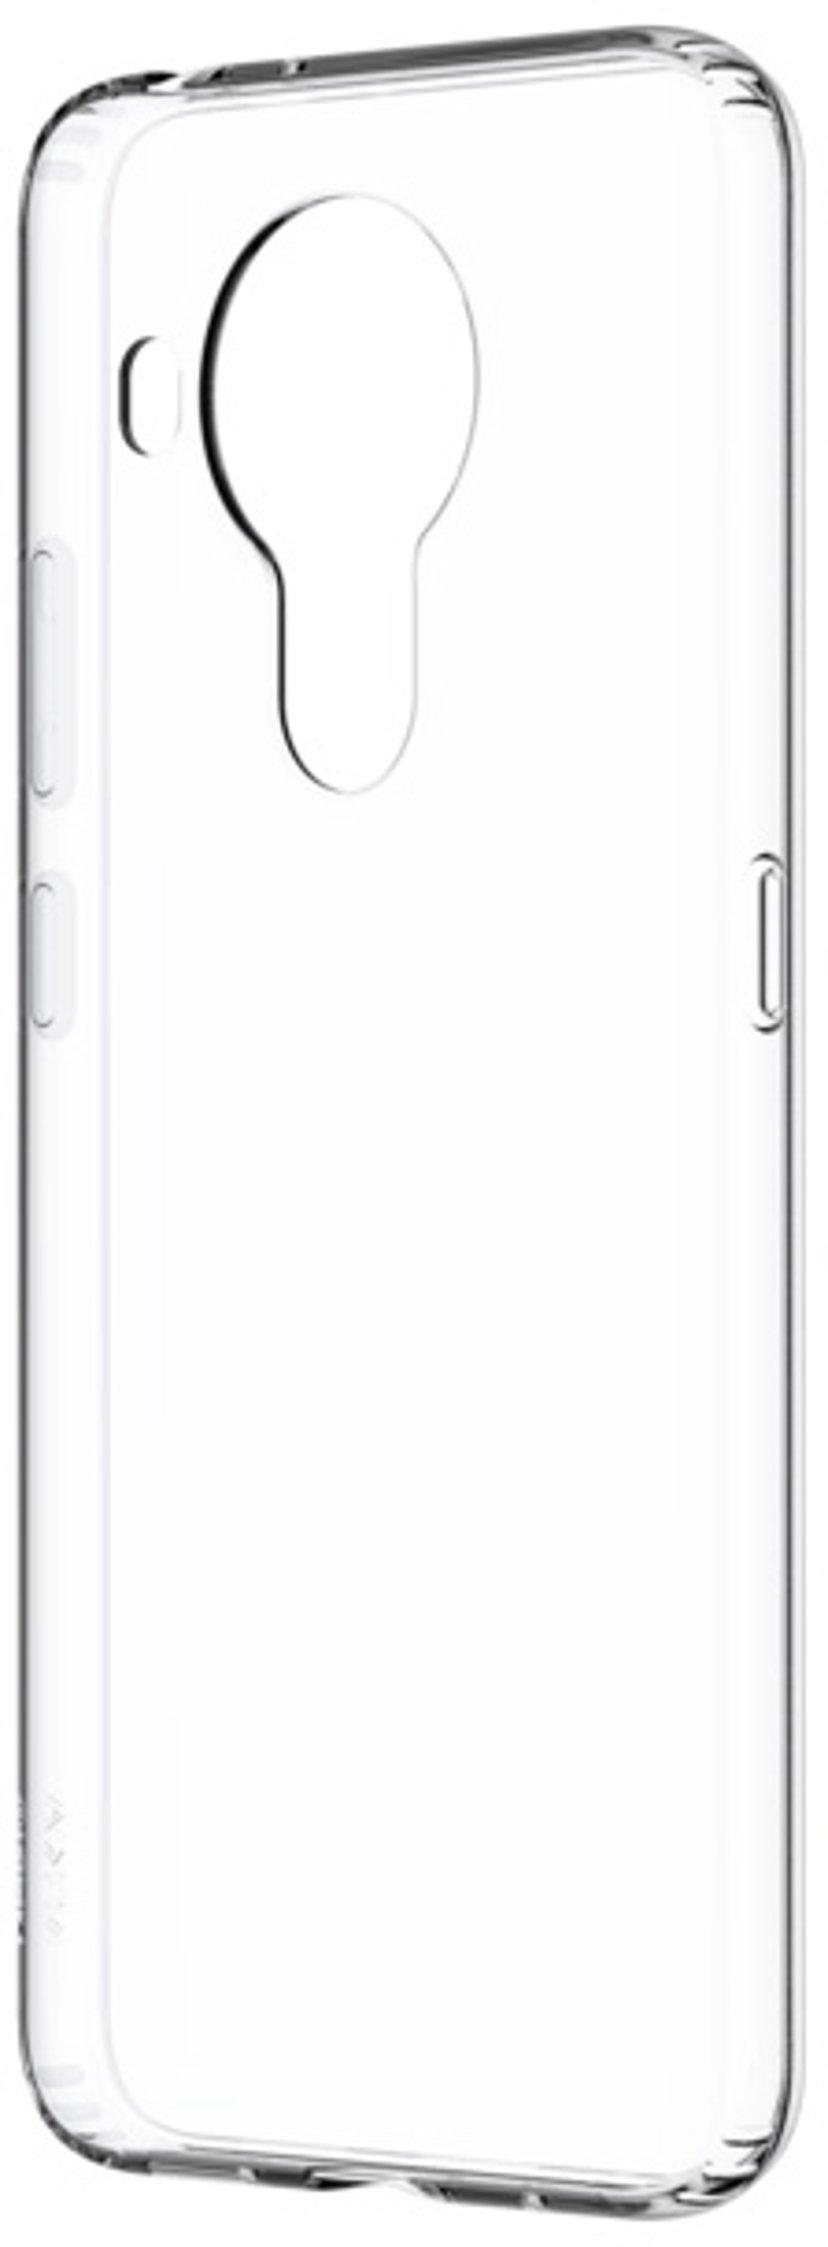 Nokia Clear Case Nokia 5.4 Transparent